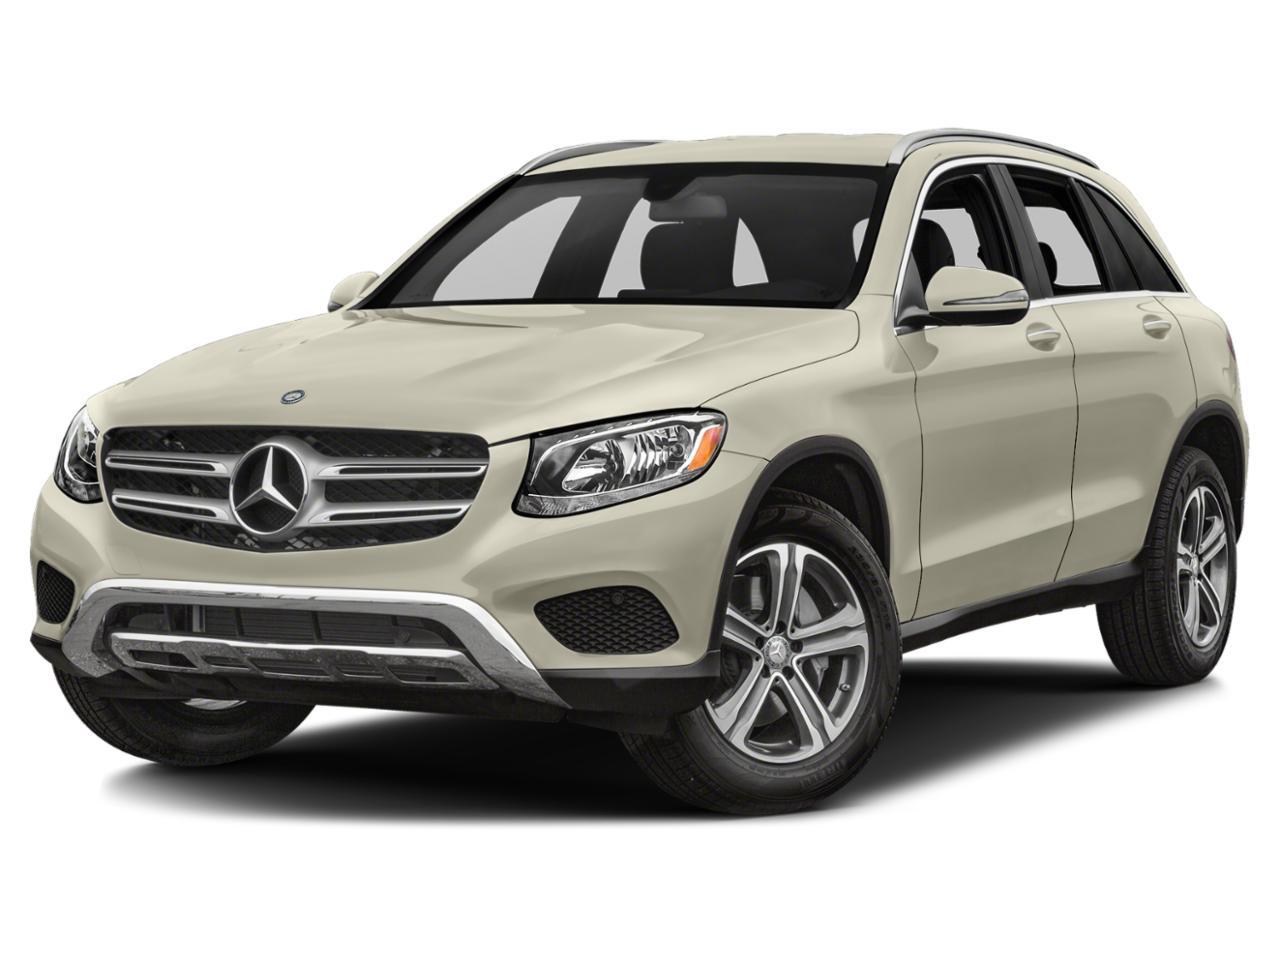 2018 Mercedes-Benz GLC Vehicle Photo in Pleasanton, CA 94588